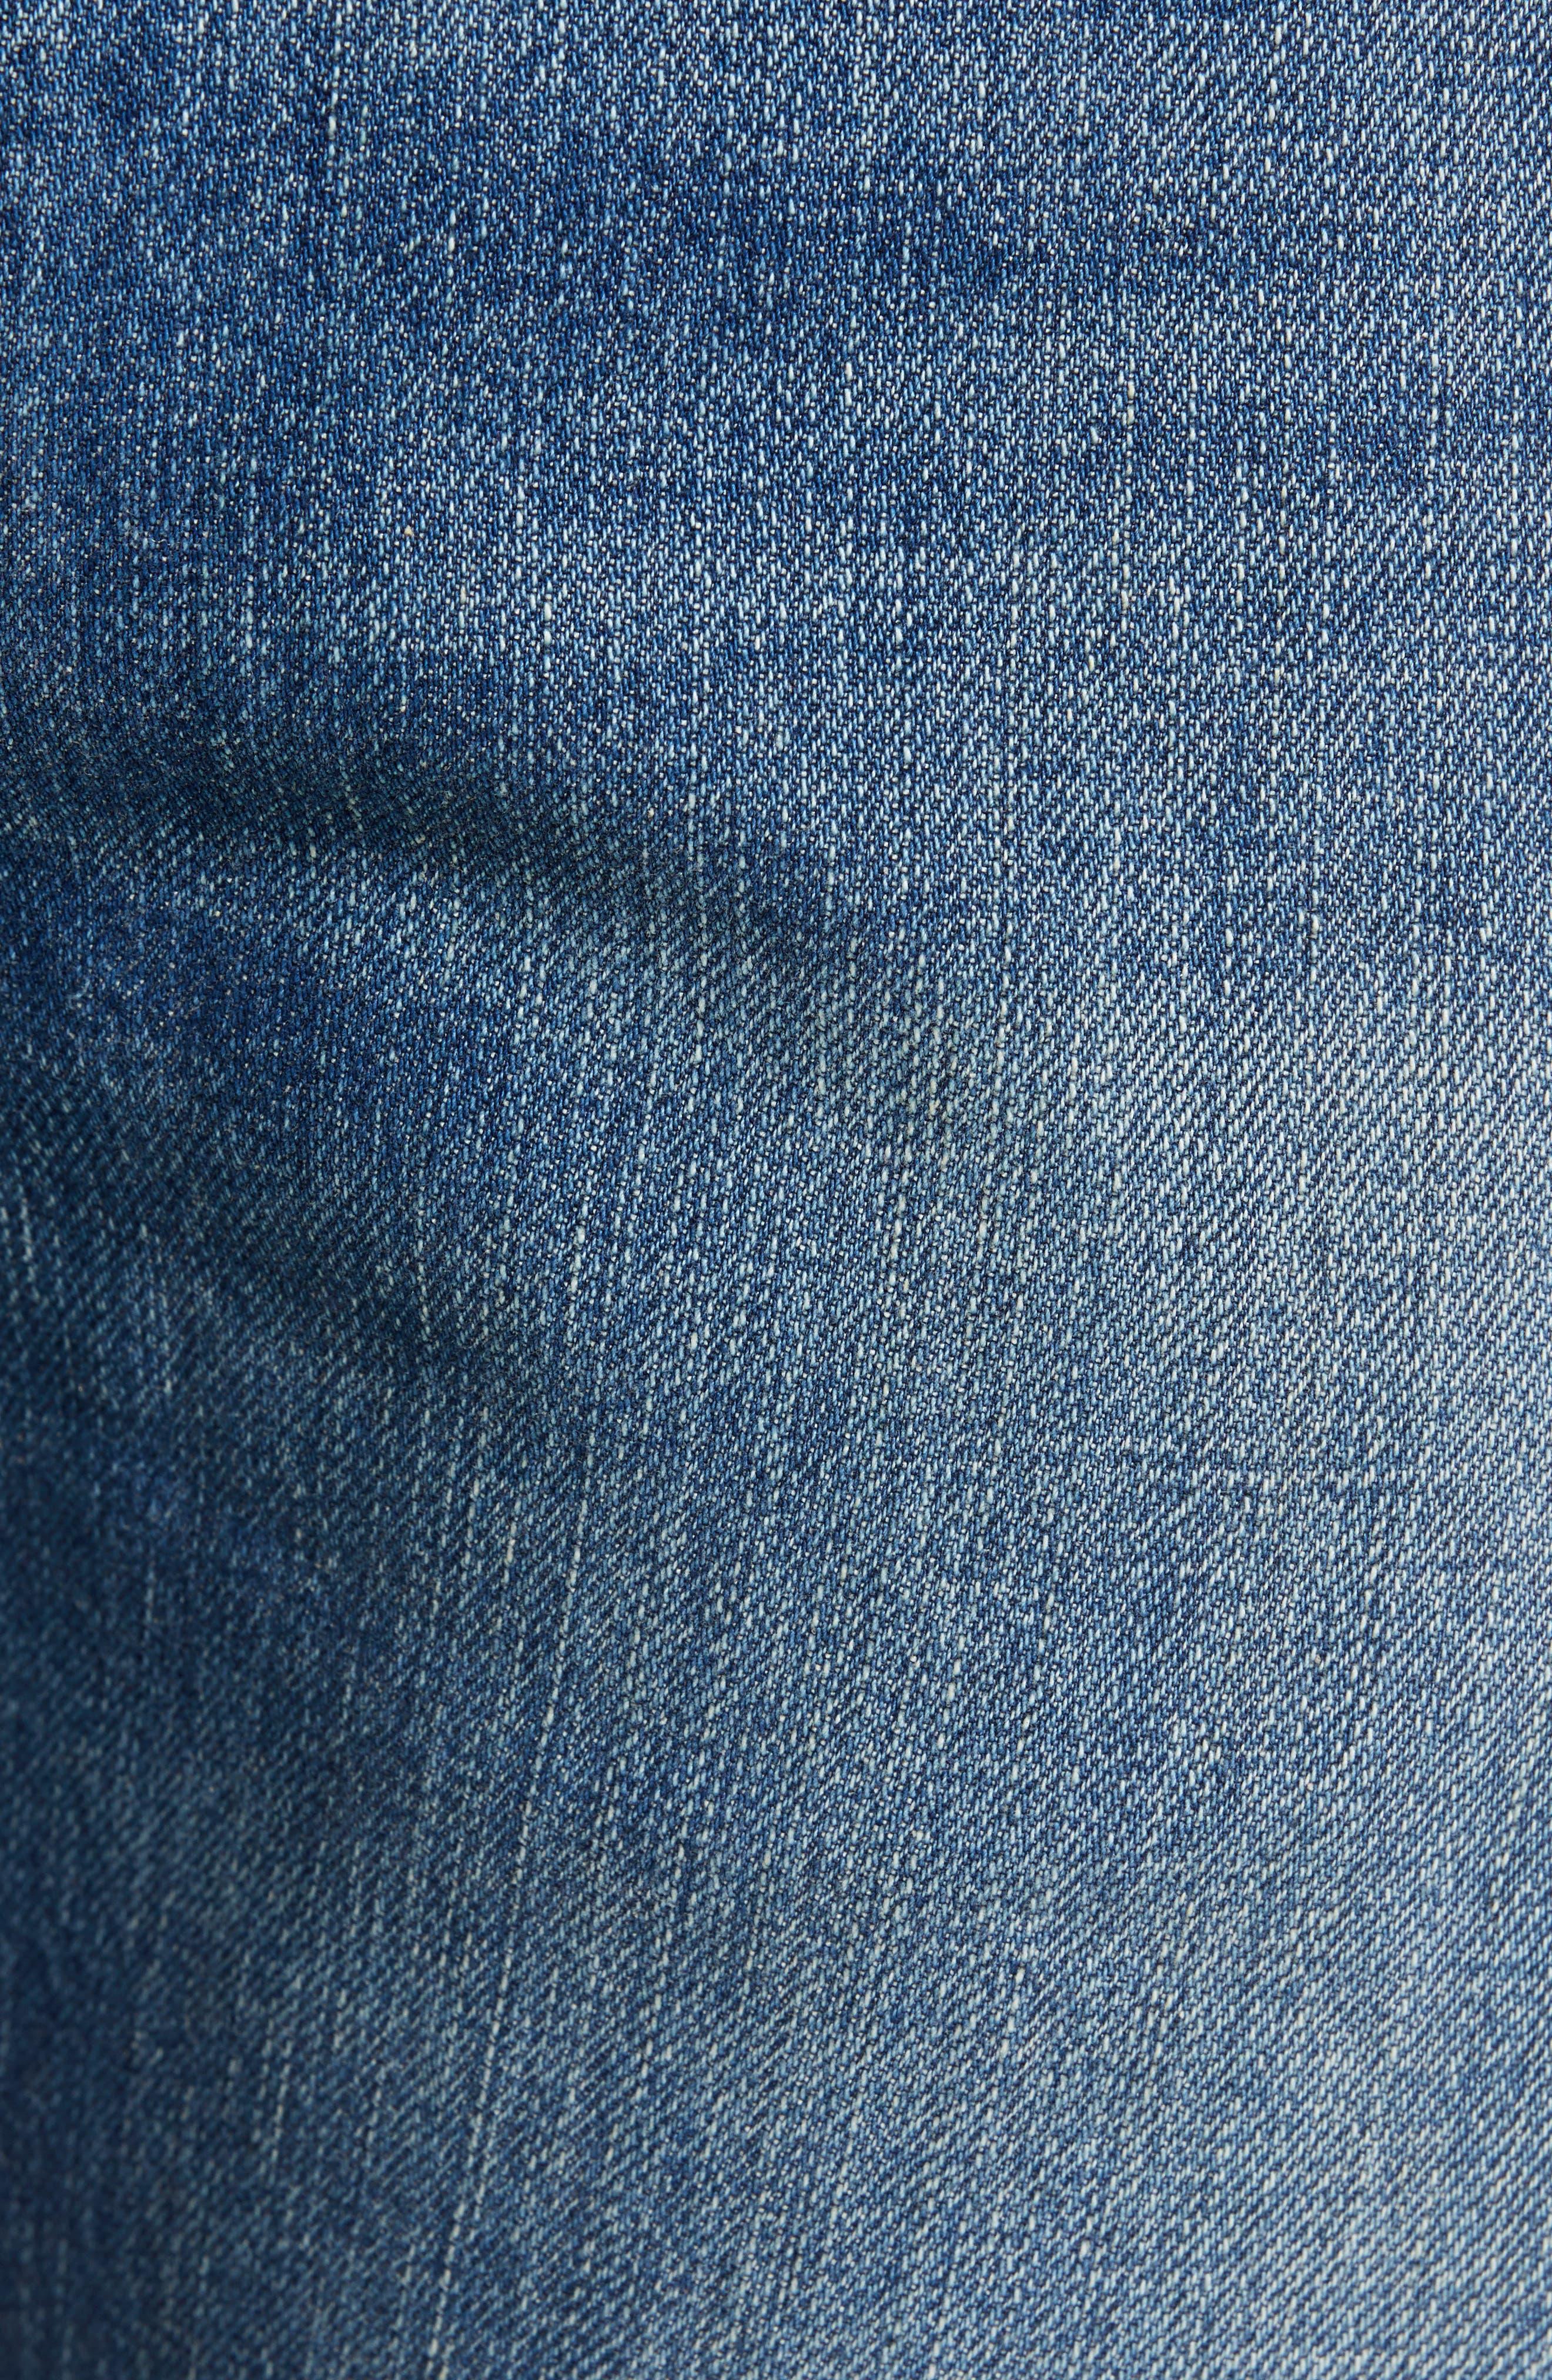 LEVI'S<SUP>®</SUP> VINTAGE CLOTHING, 1967 505<sup>™</sup> Slim Fit Selvedge Jeans, Alternate thumbnail 6, color, SPUTNIK